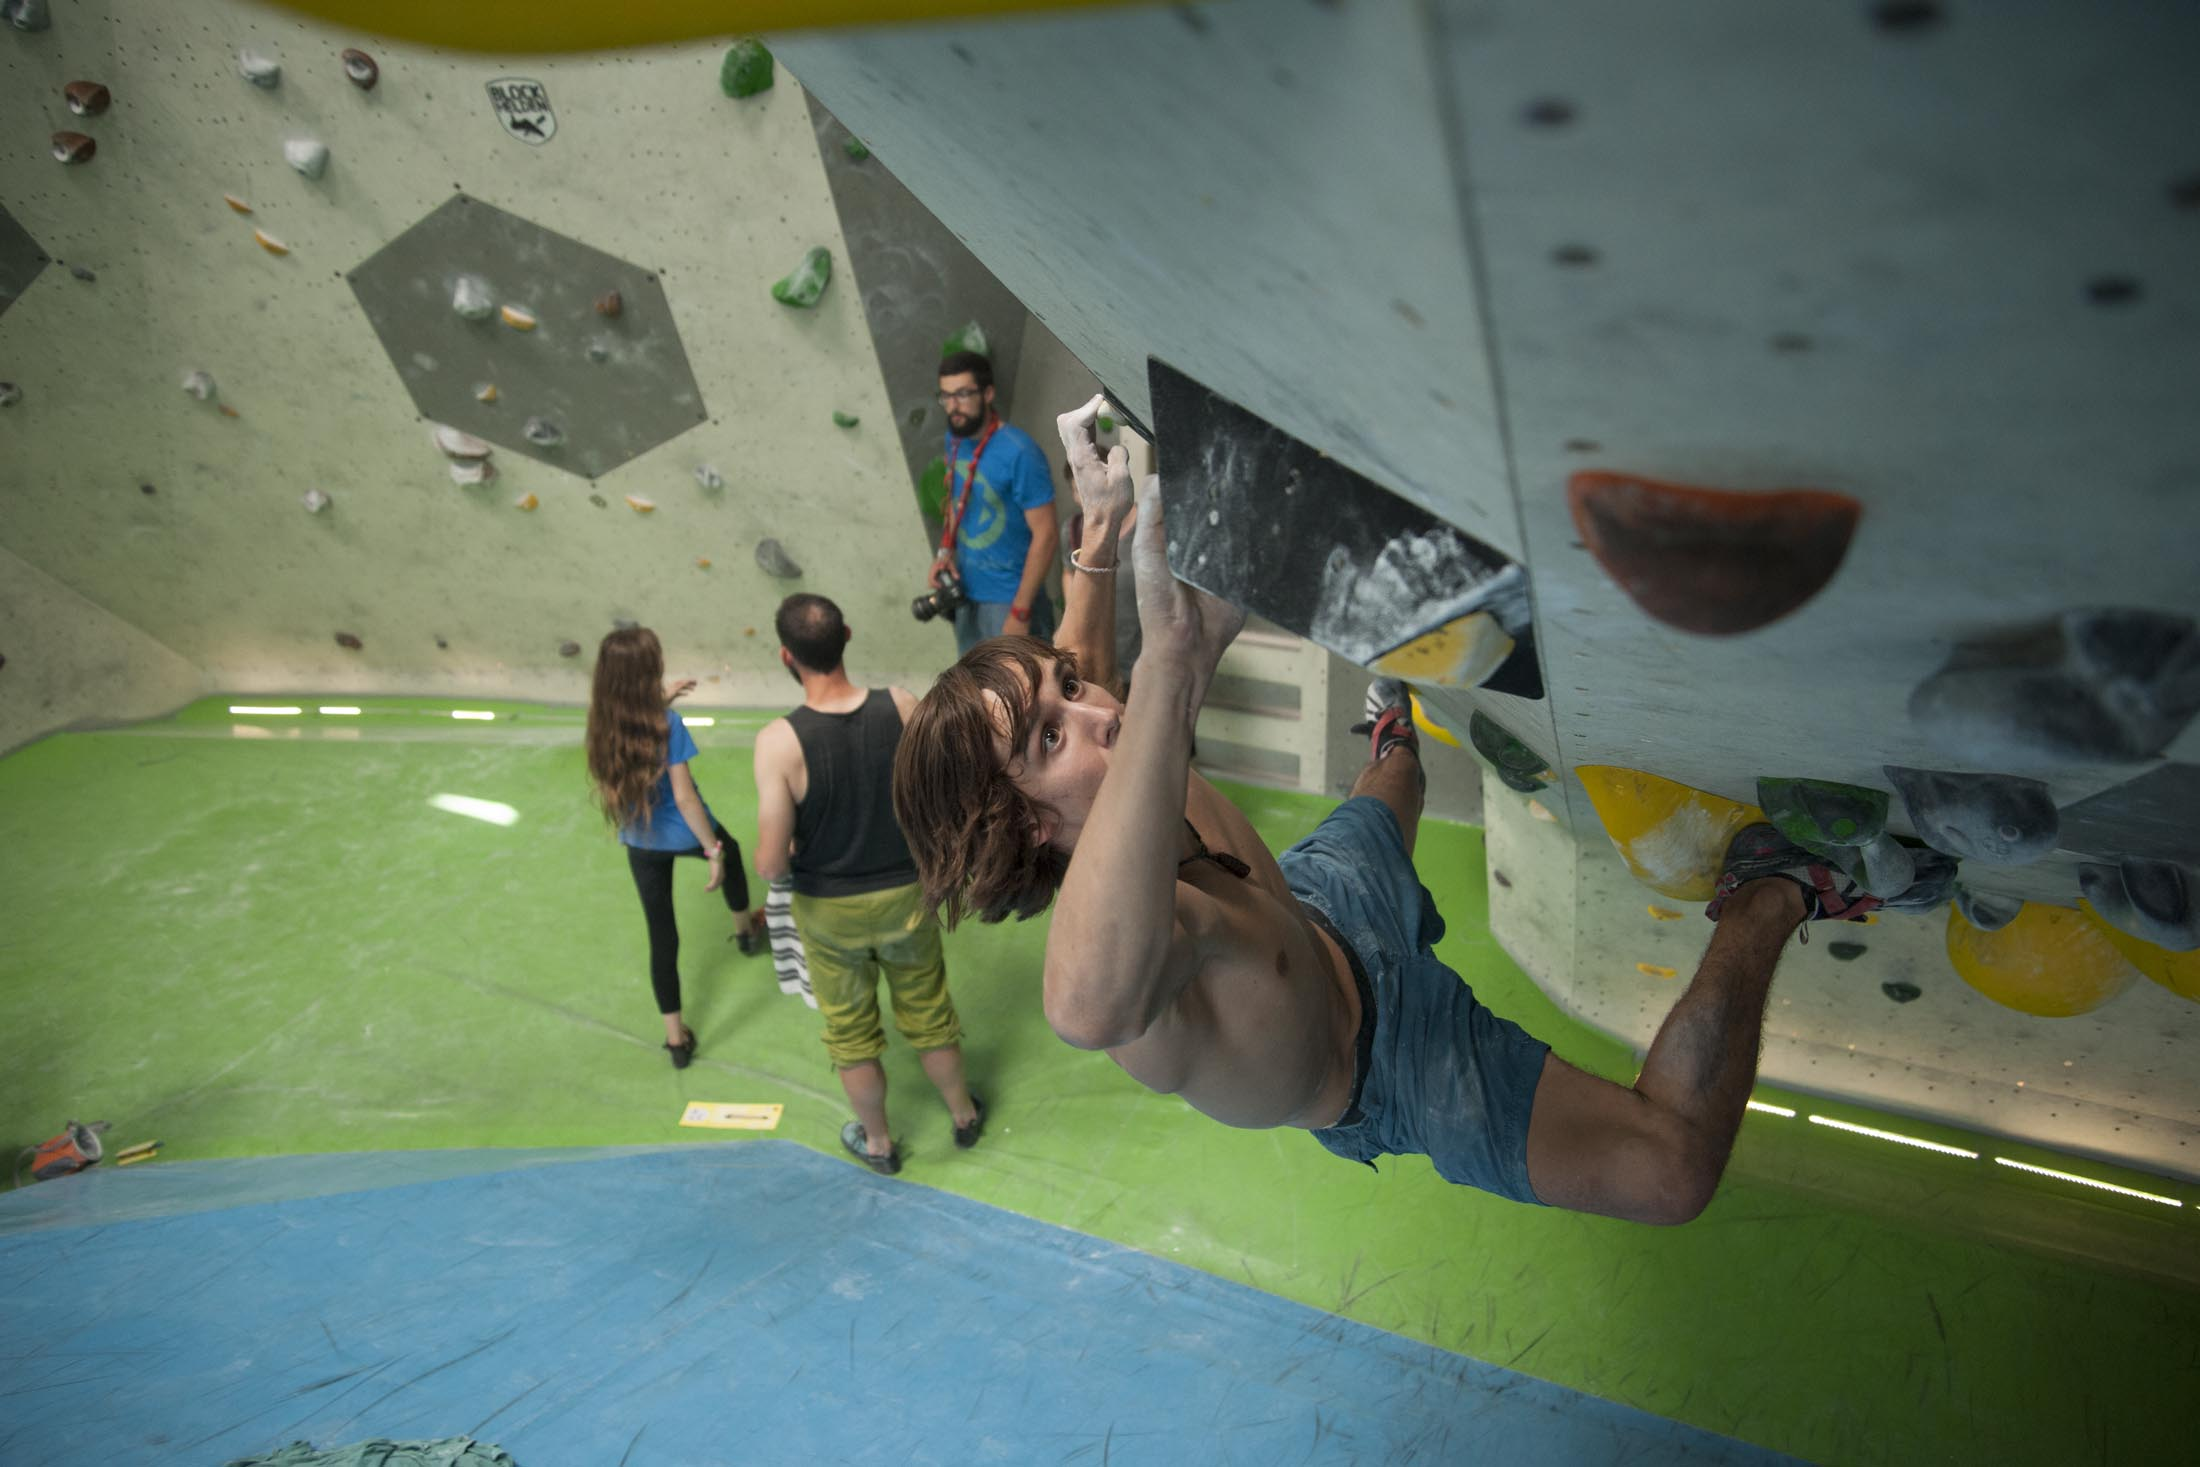 Quali, internationaler bouldercup Frankenjura 2016, BLOCKHELDEN Erlangen, Mammut, Bergfreunde.de, Boulderwettkampf07092016239